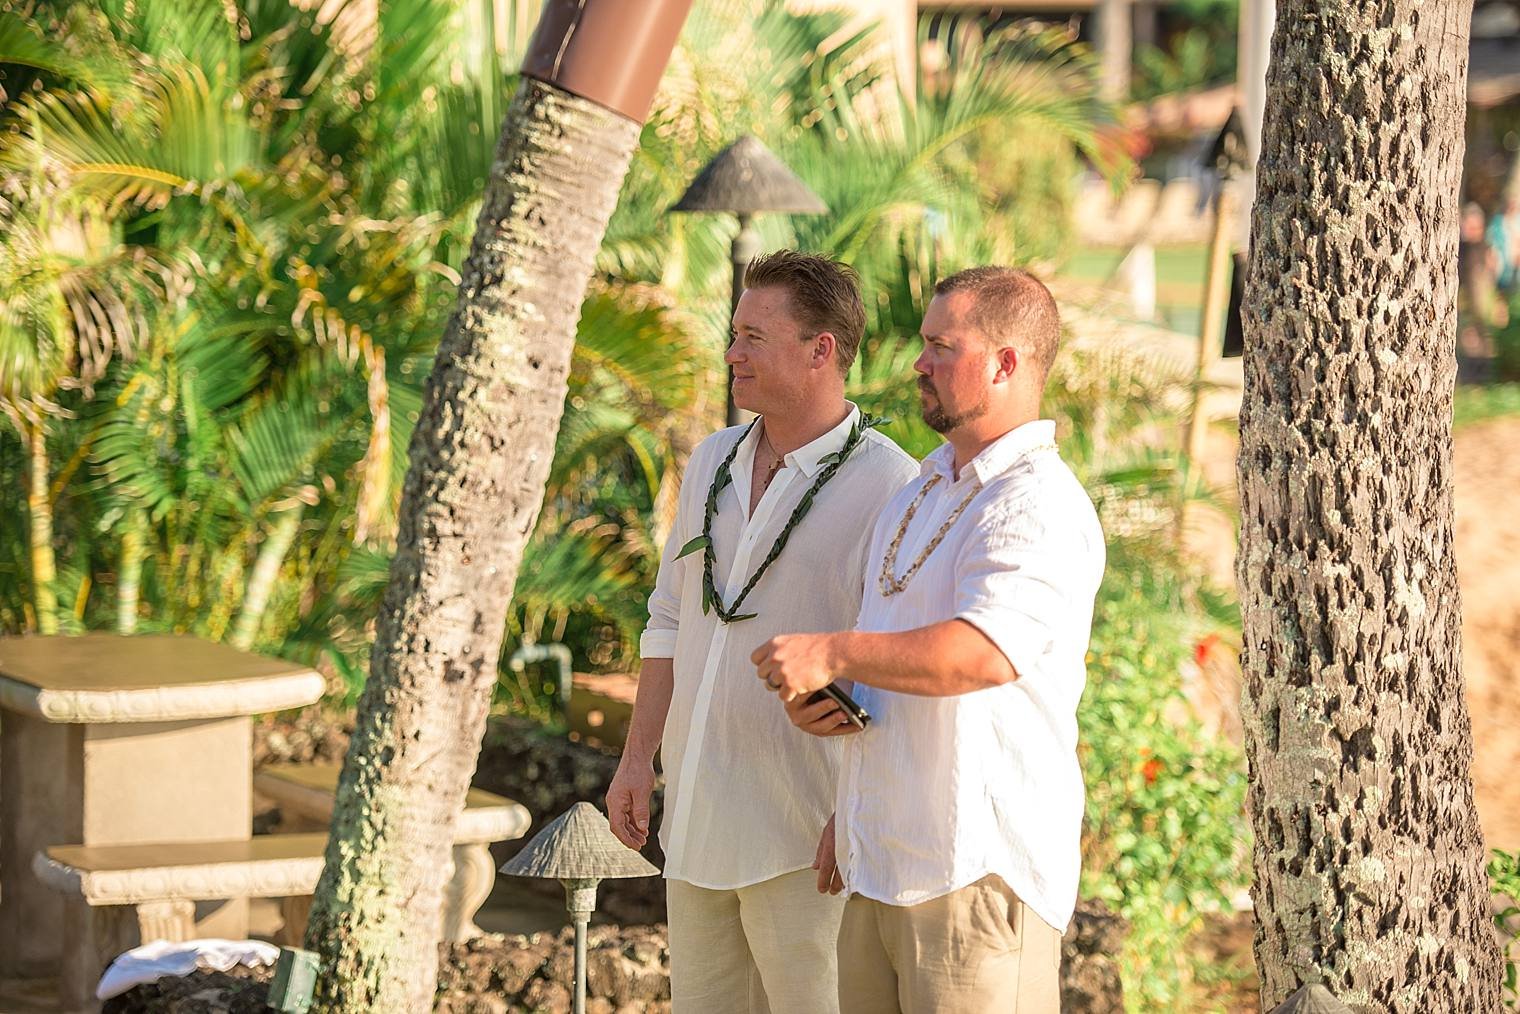 Destination Wedding at Sea House Napili - Maui Wedding Photographer_0014